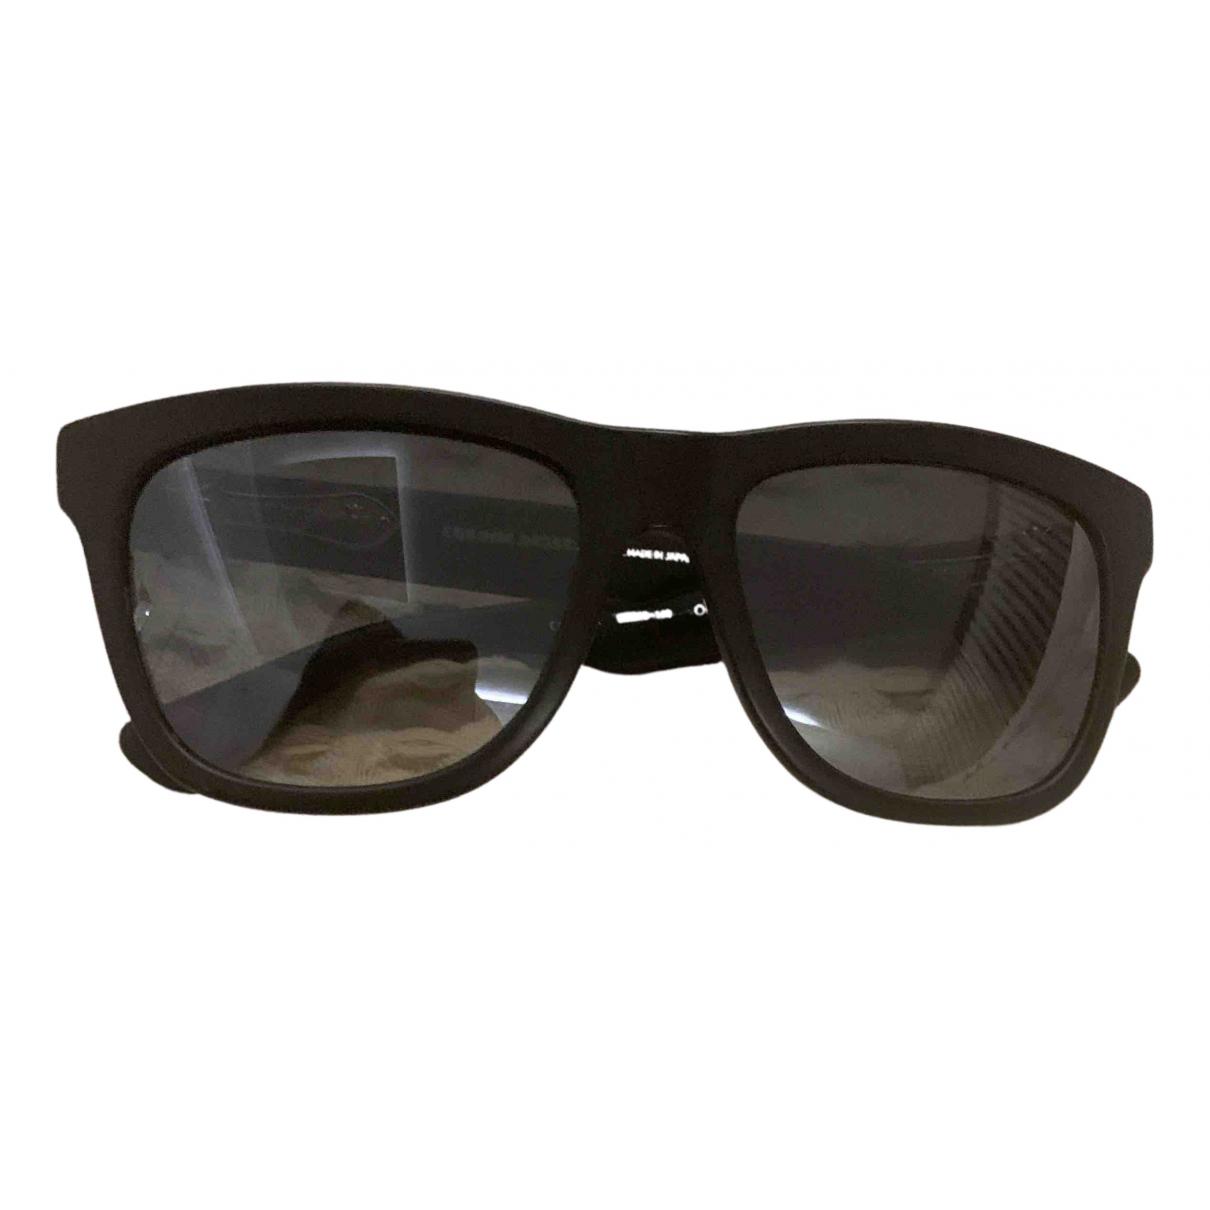 Chrome Hearts N Black Sunglasses for Women N